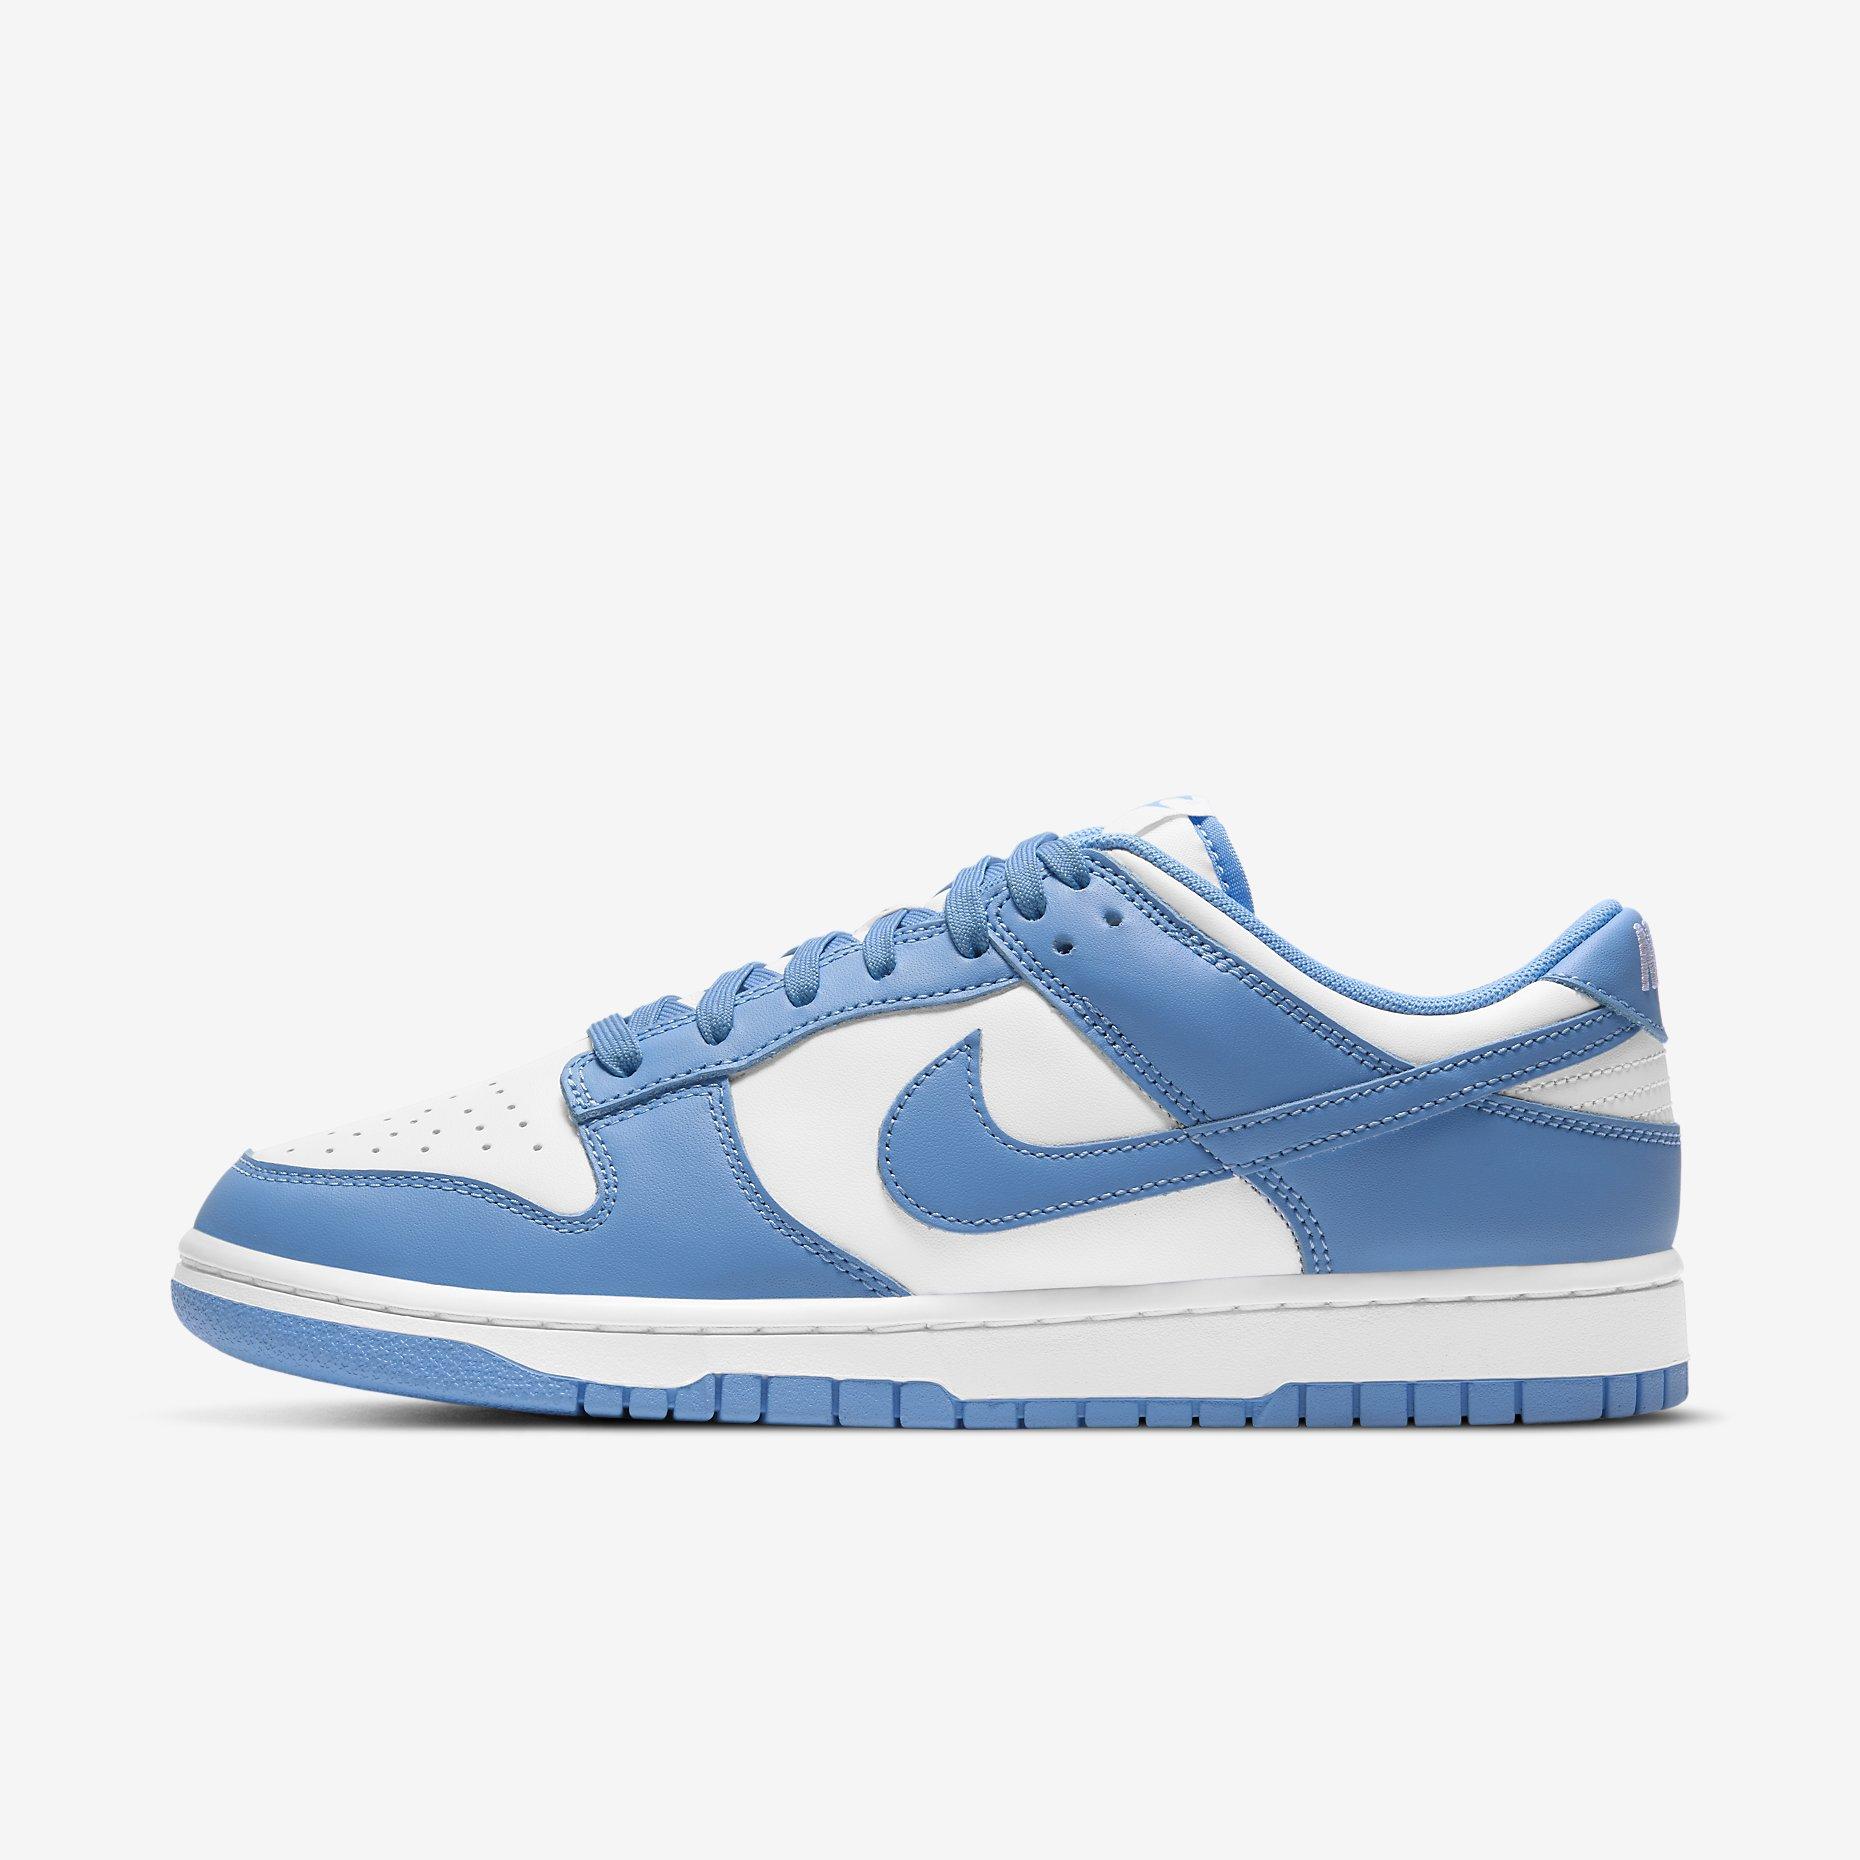 Nike Dunk Low Retro 'University Blue'}